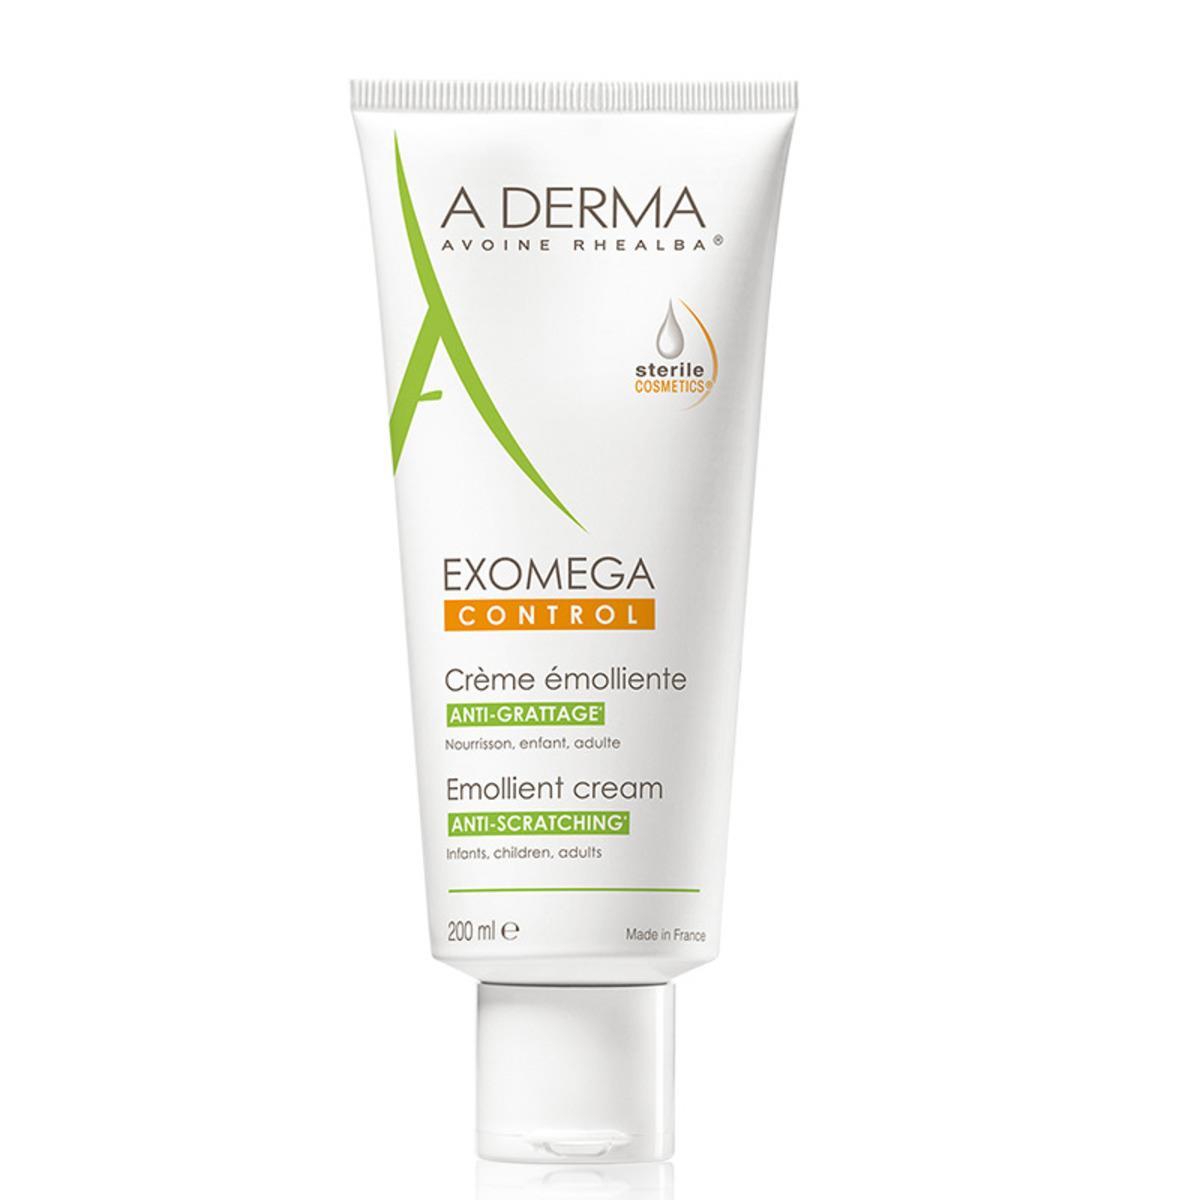 A-Derma Exomega Control Crema Emoliente 200Ml